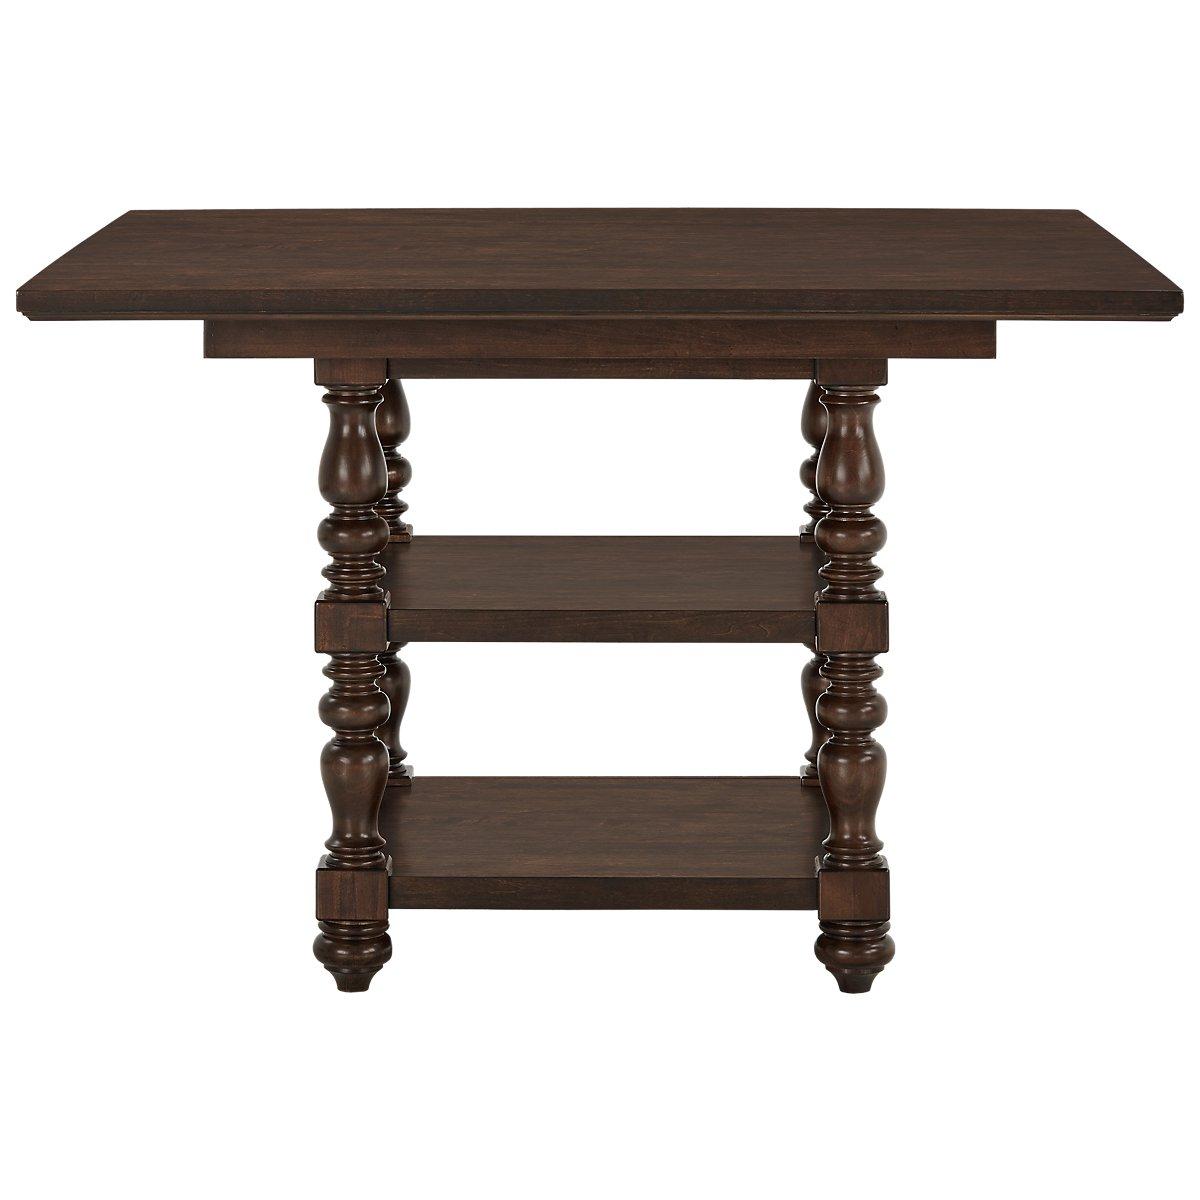 City Furniture Savannah Dark Tone High Dining Table